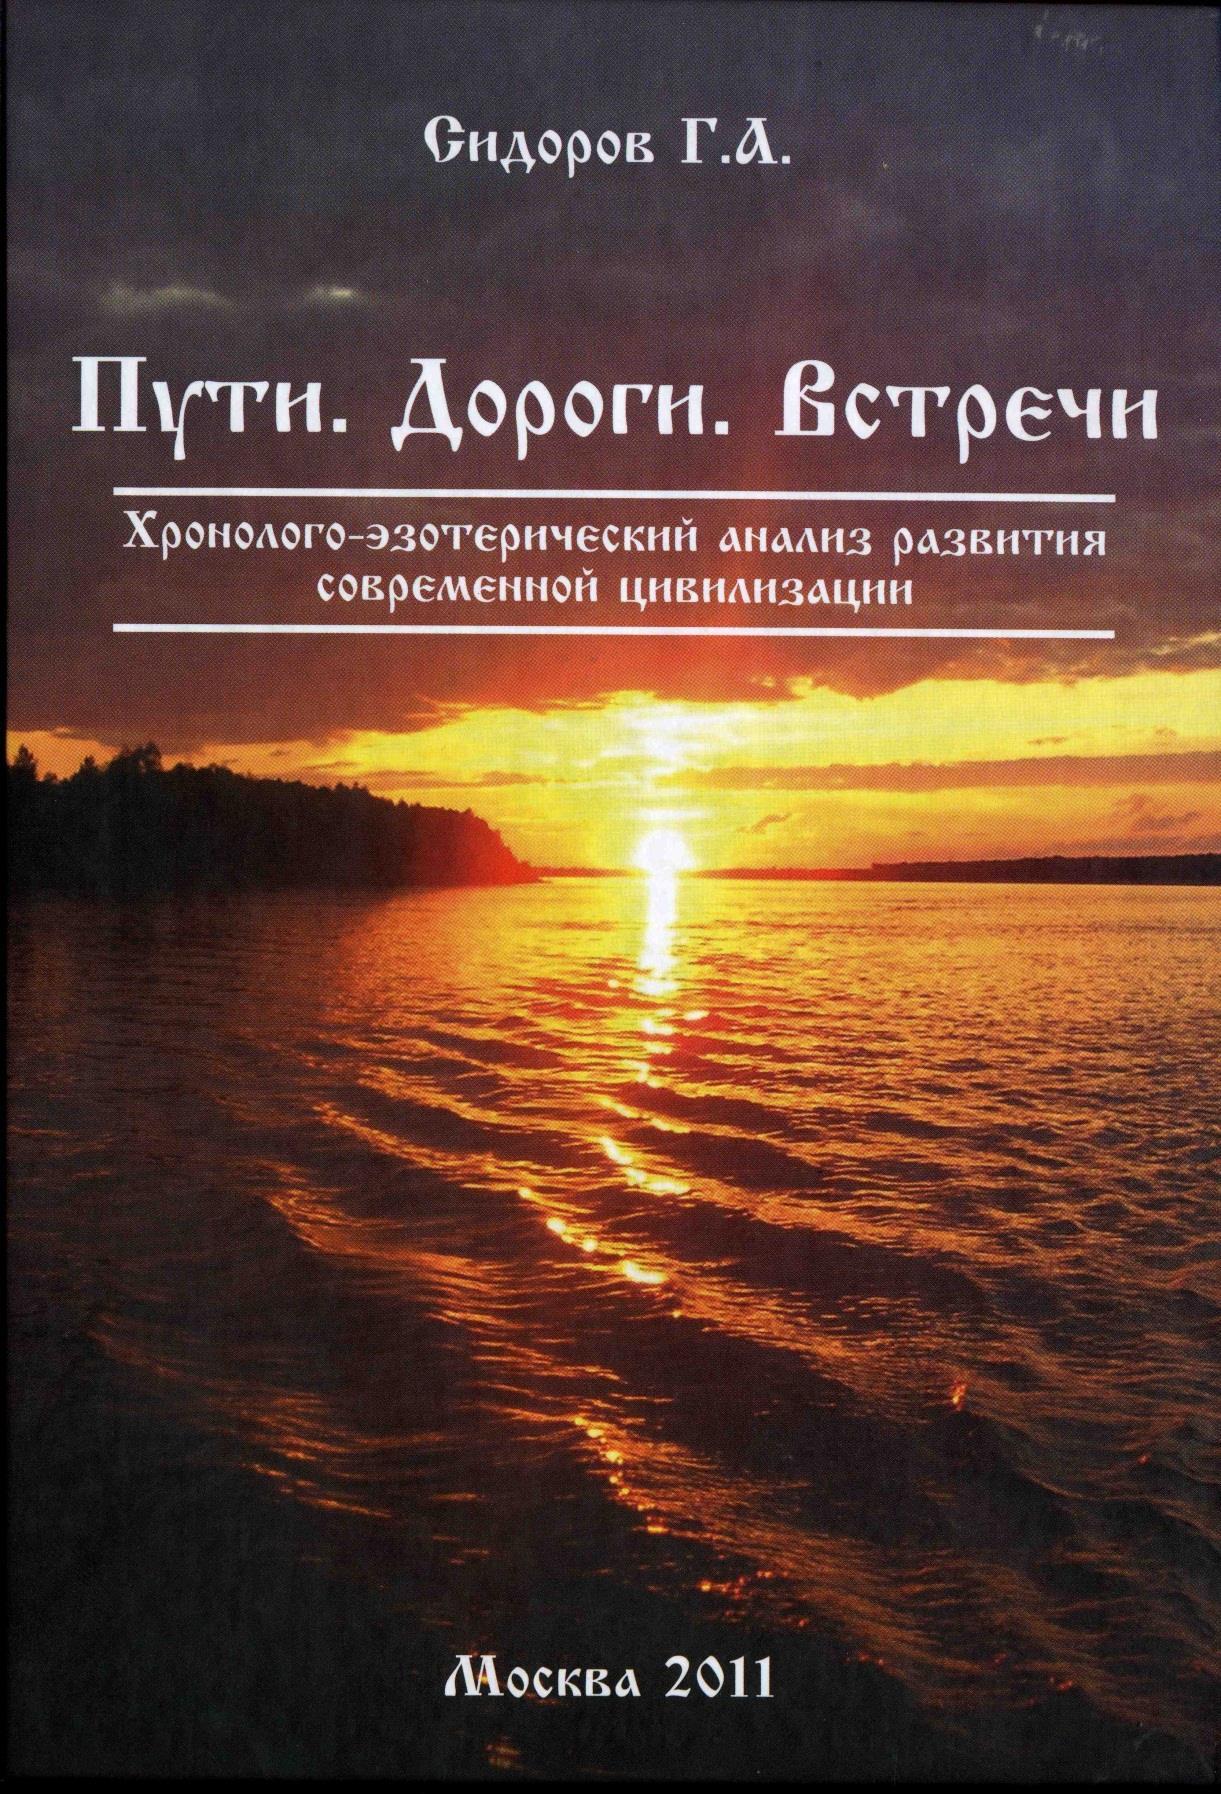 Обложка книги Пропавший лайнер